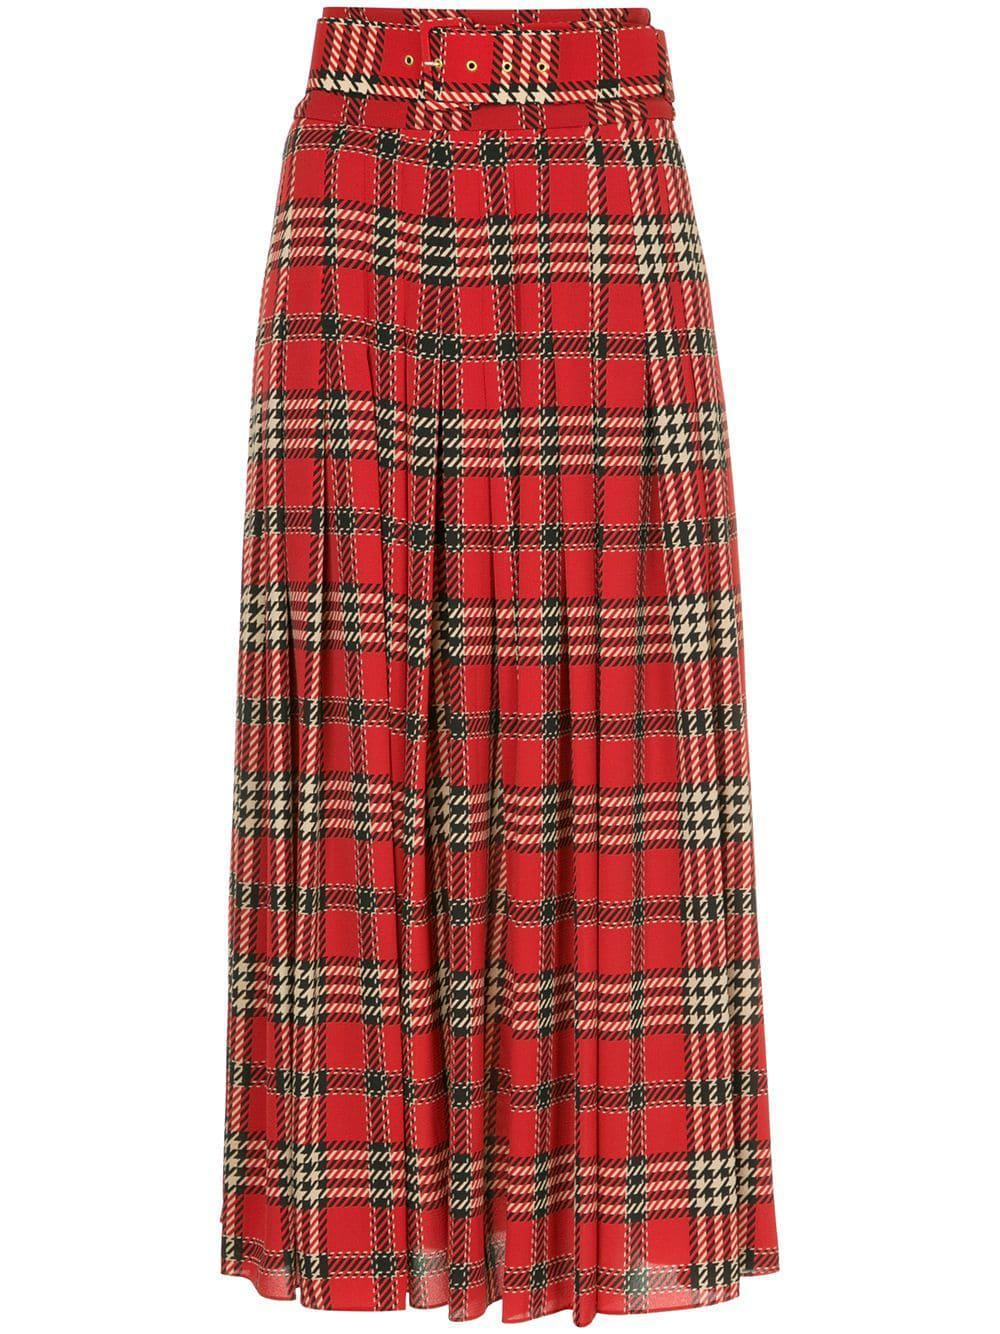 Emilia Wickstead Tartan Pleated Skirt In Red